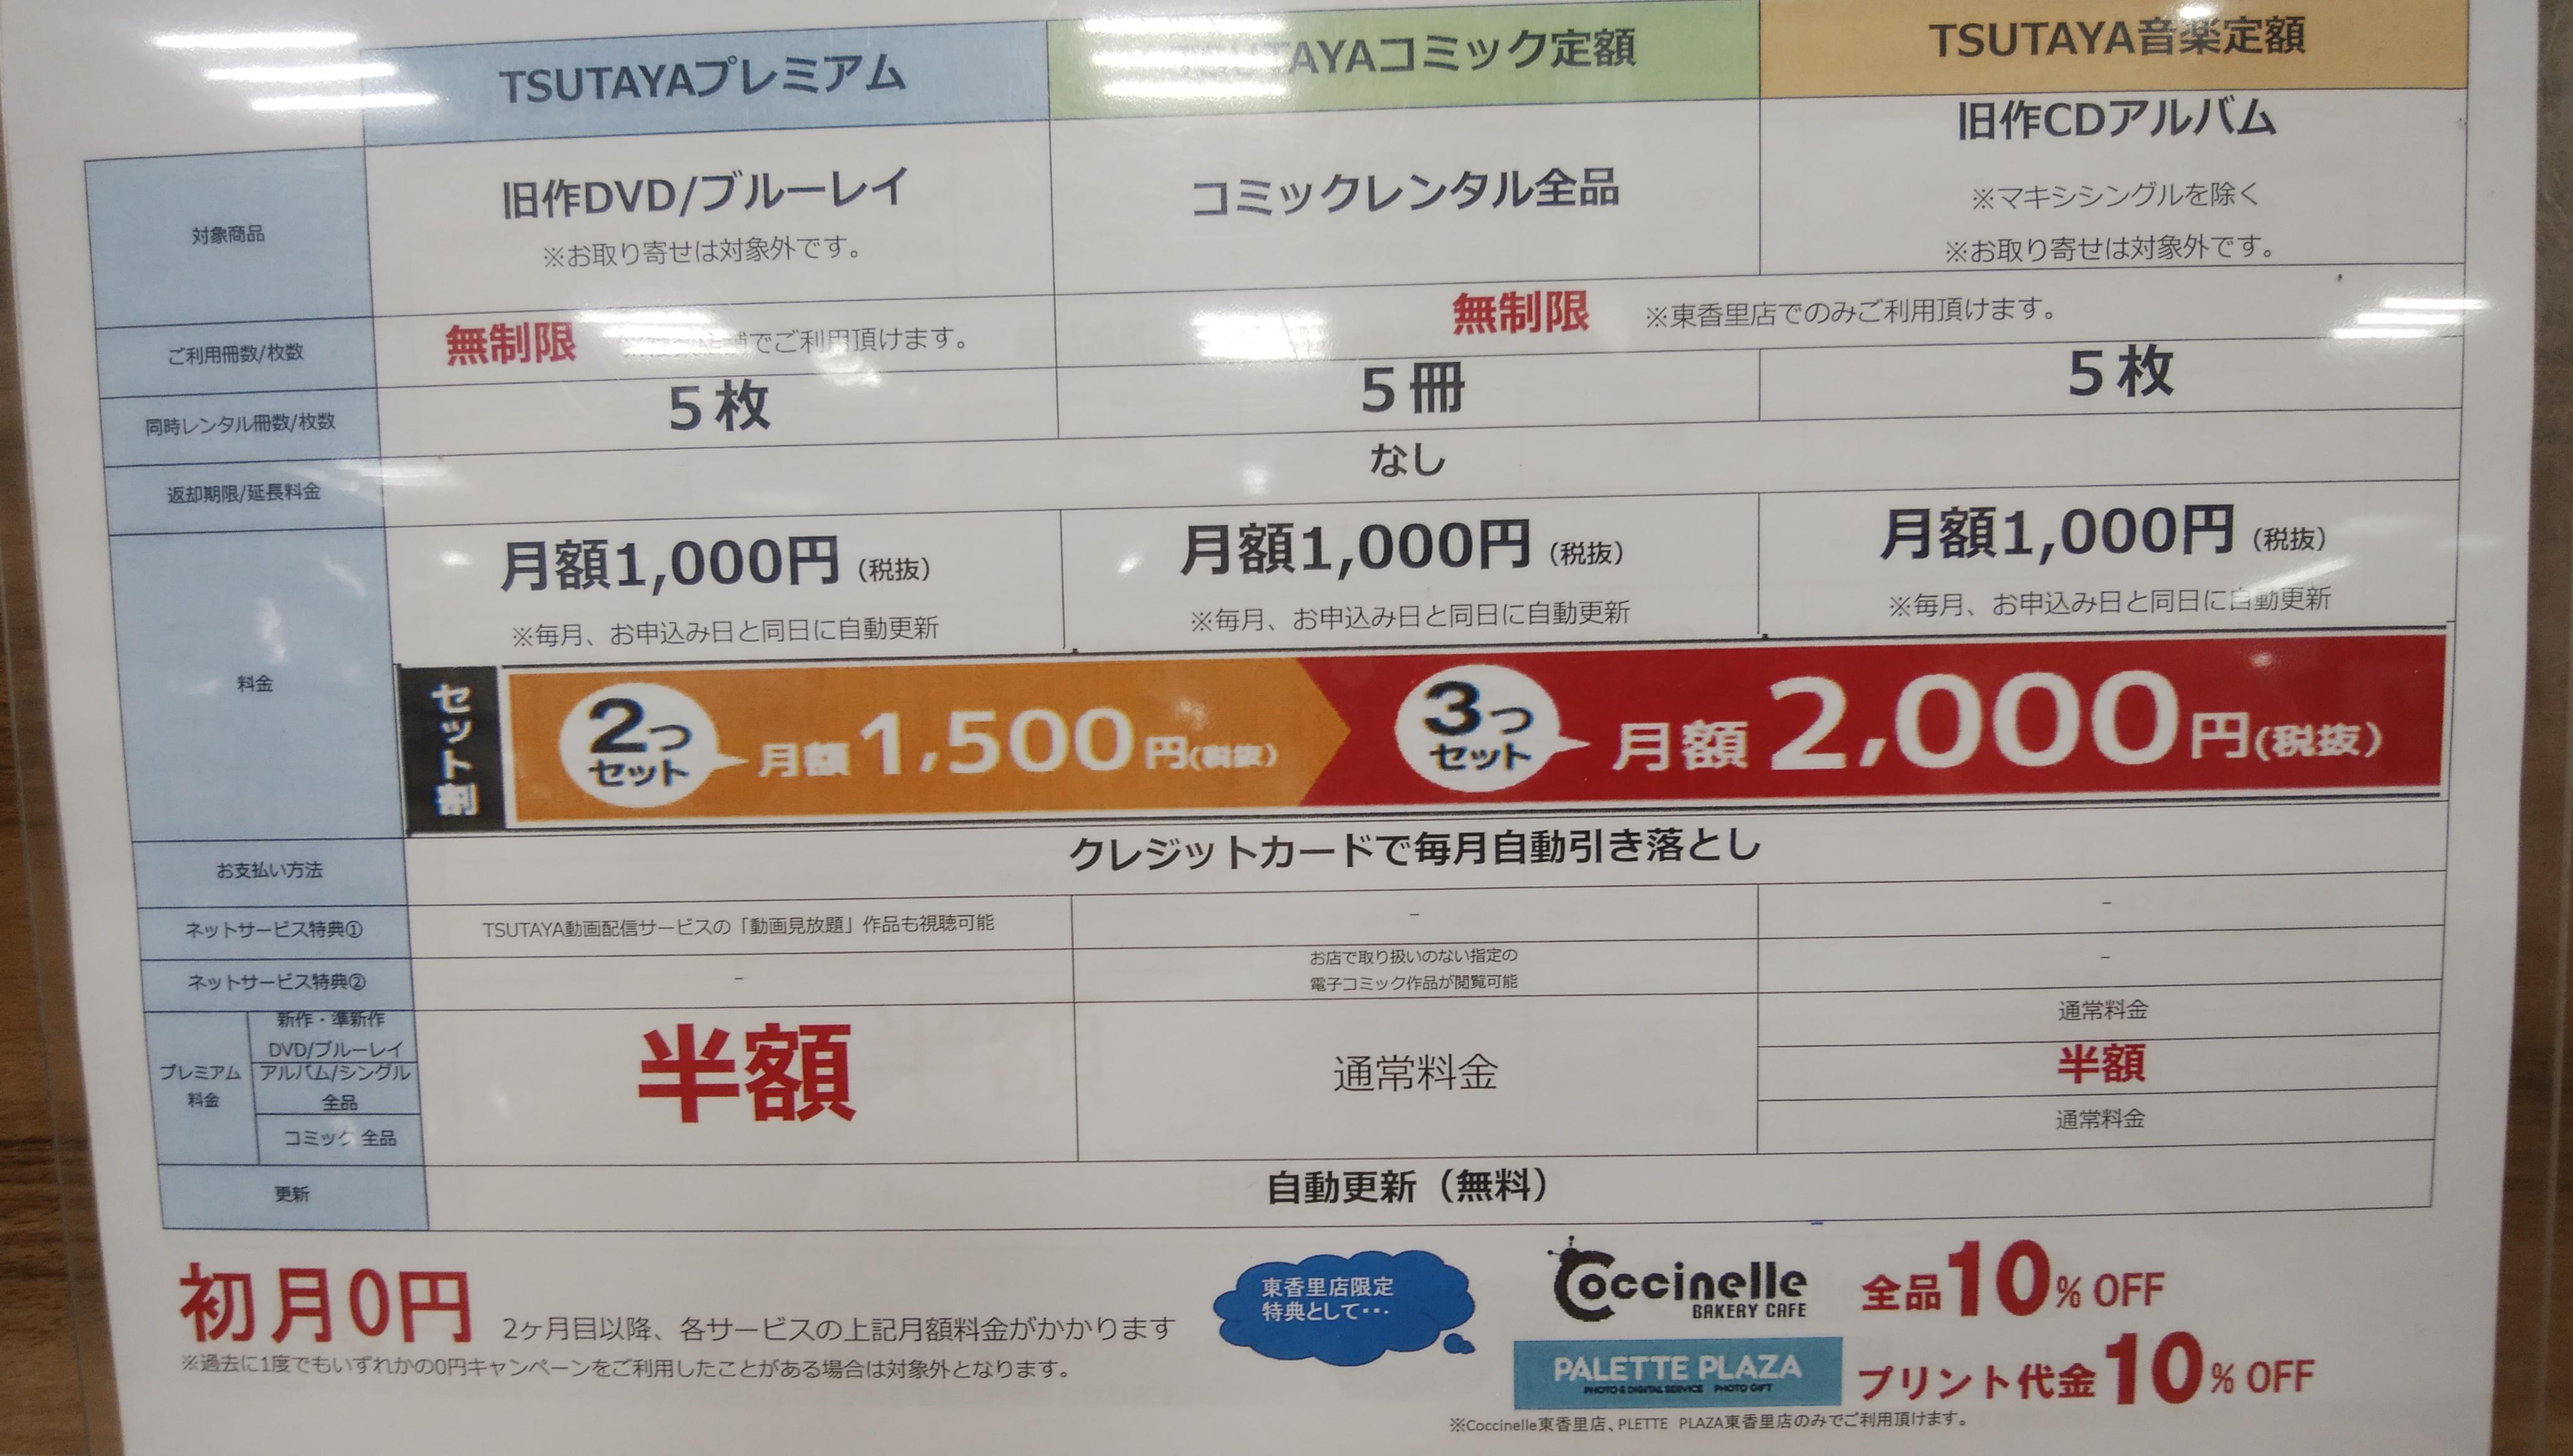 CD、コミック、DVDが無料!「TSUTAYA定額プランの無料期間を見逃すな!」